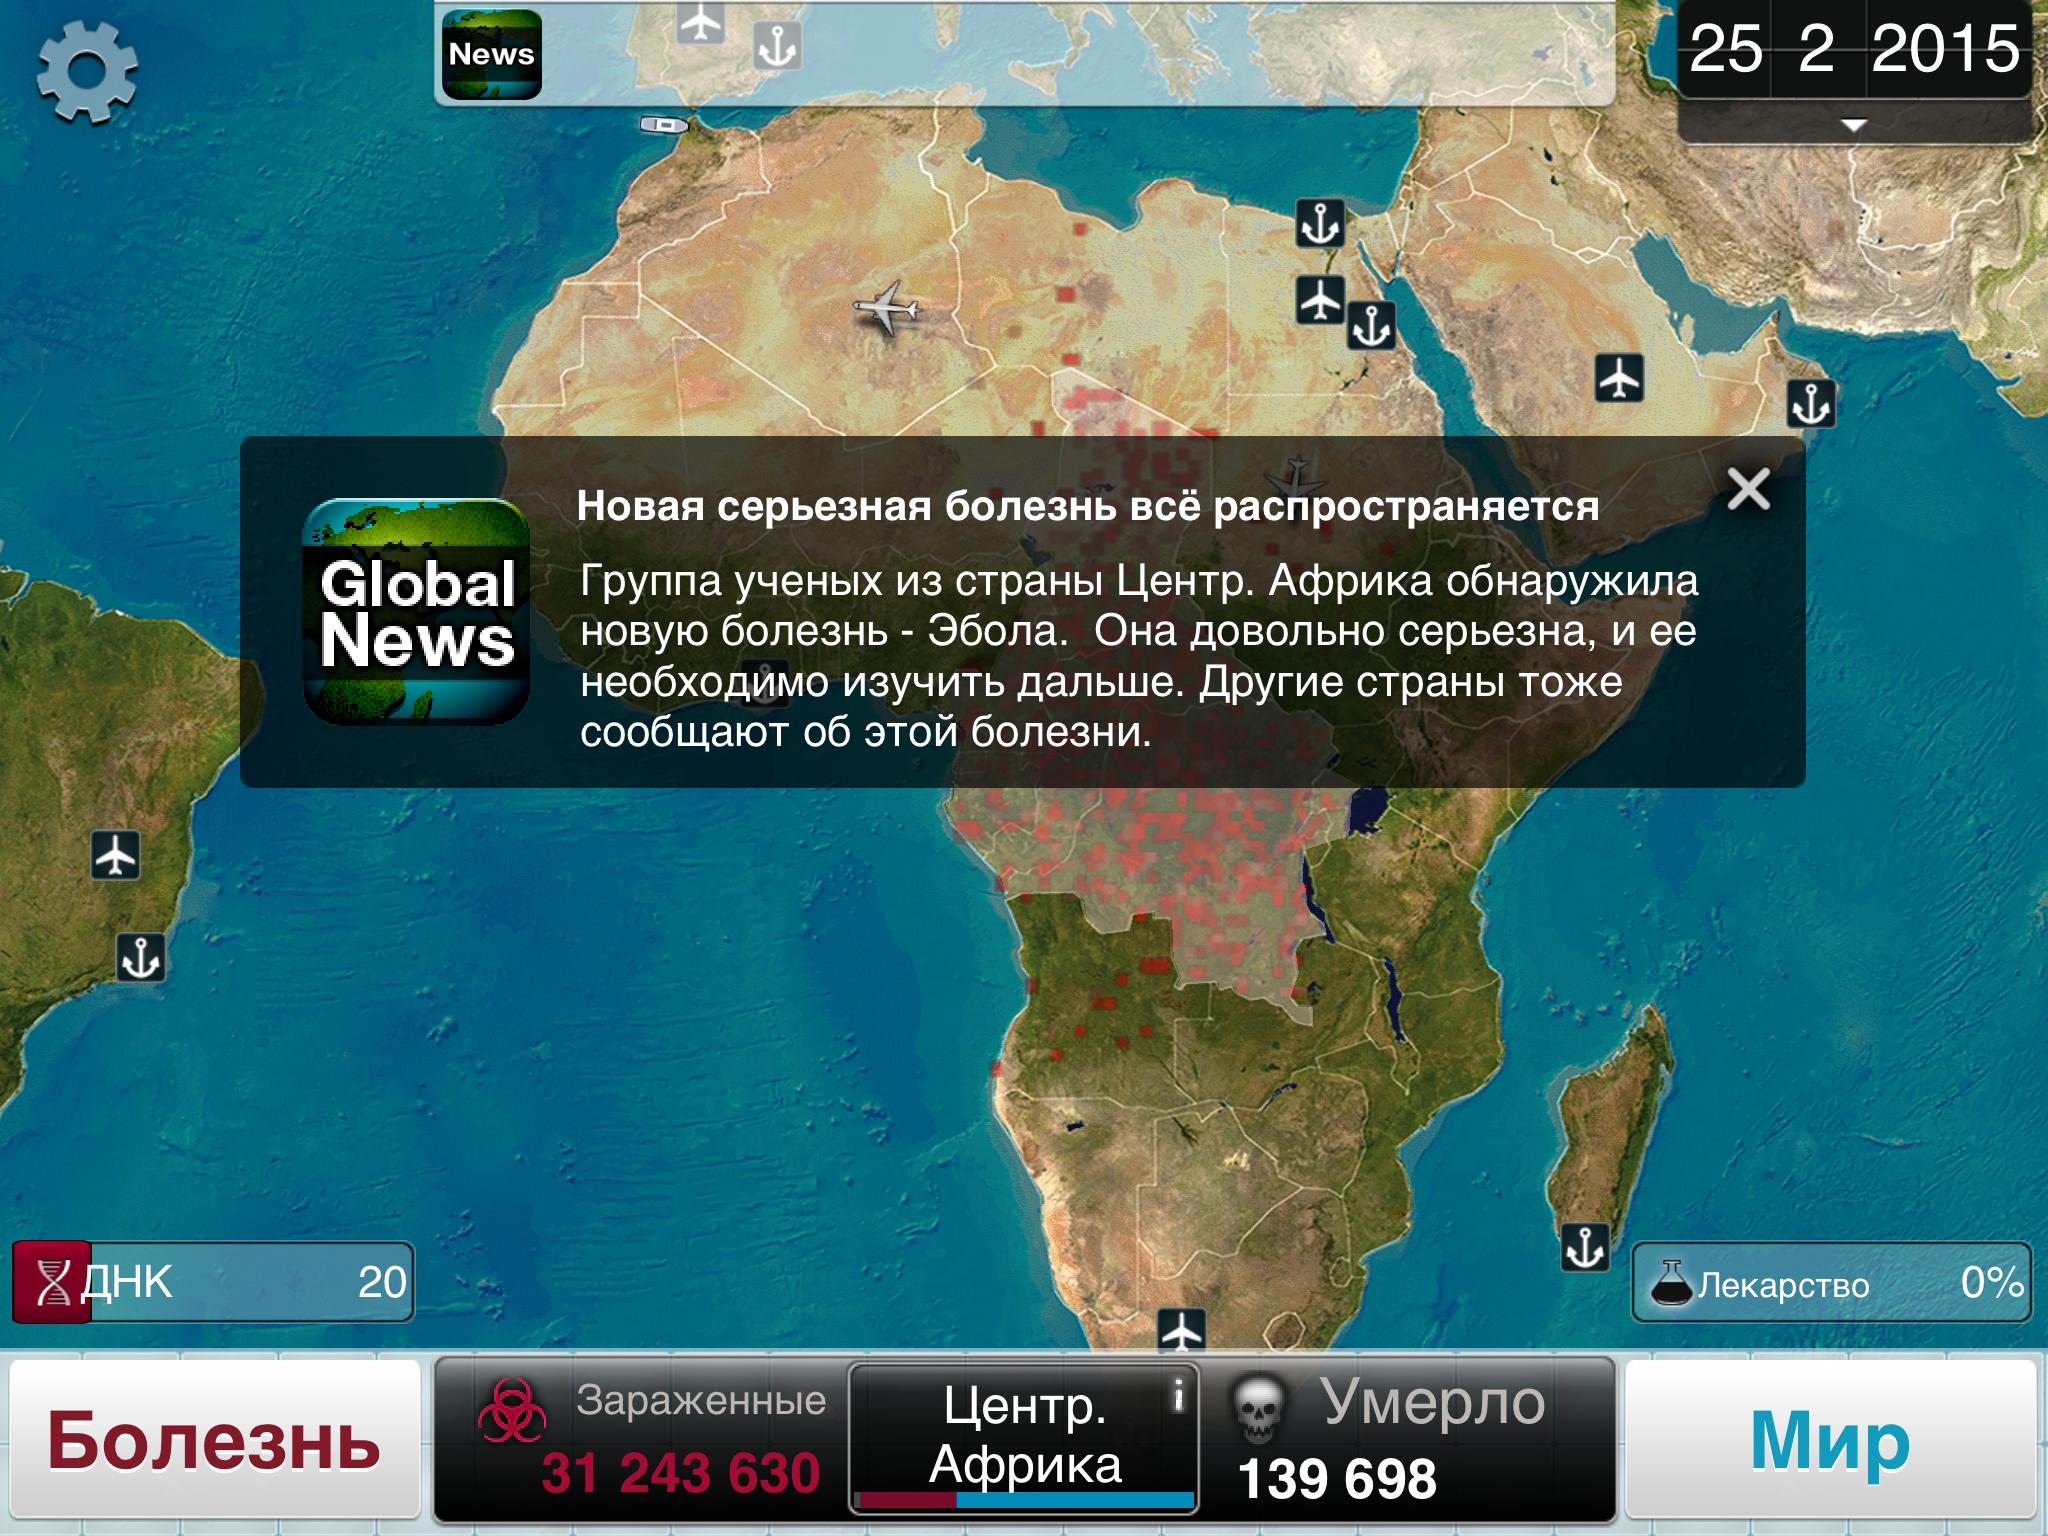 эбола вирус лихорадка